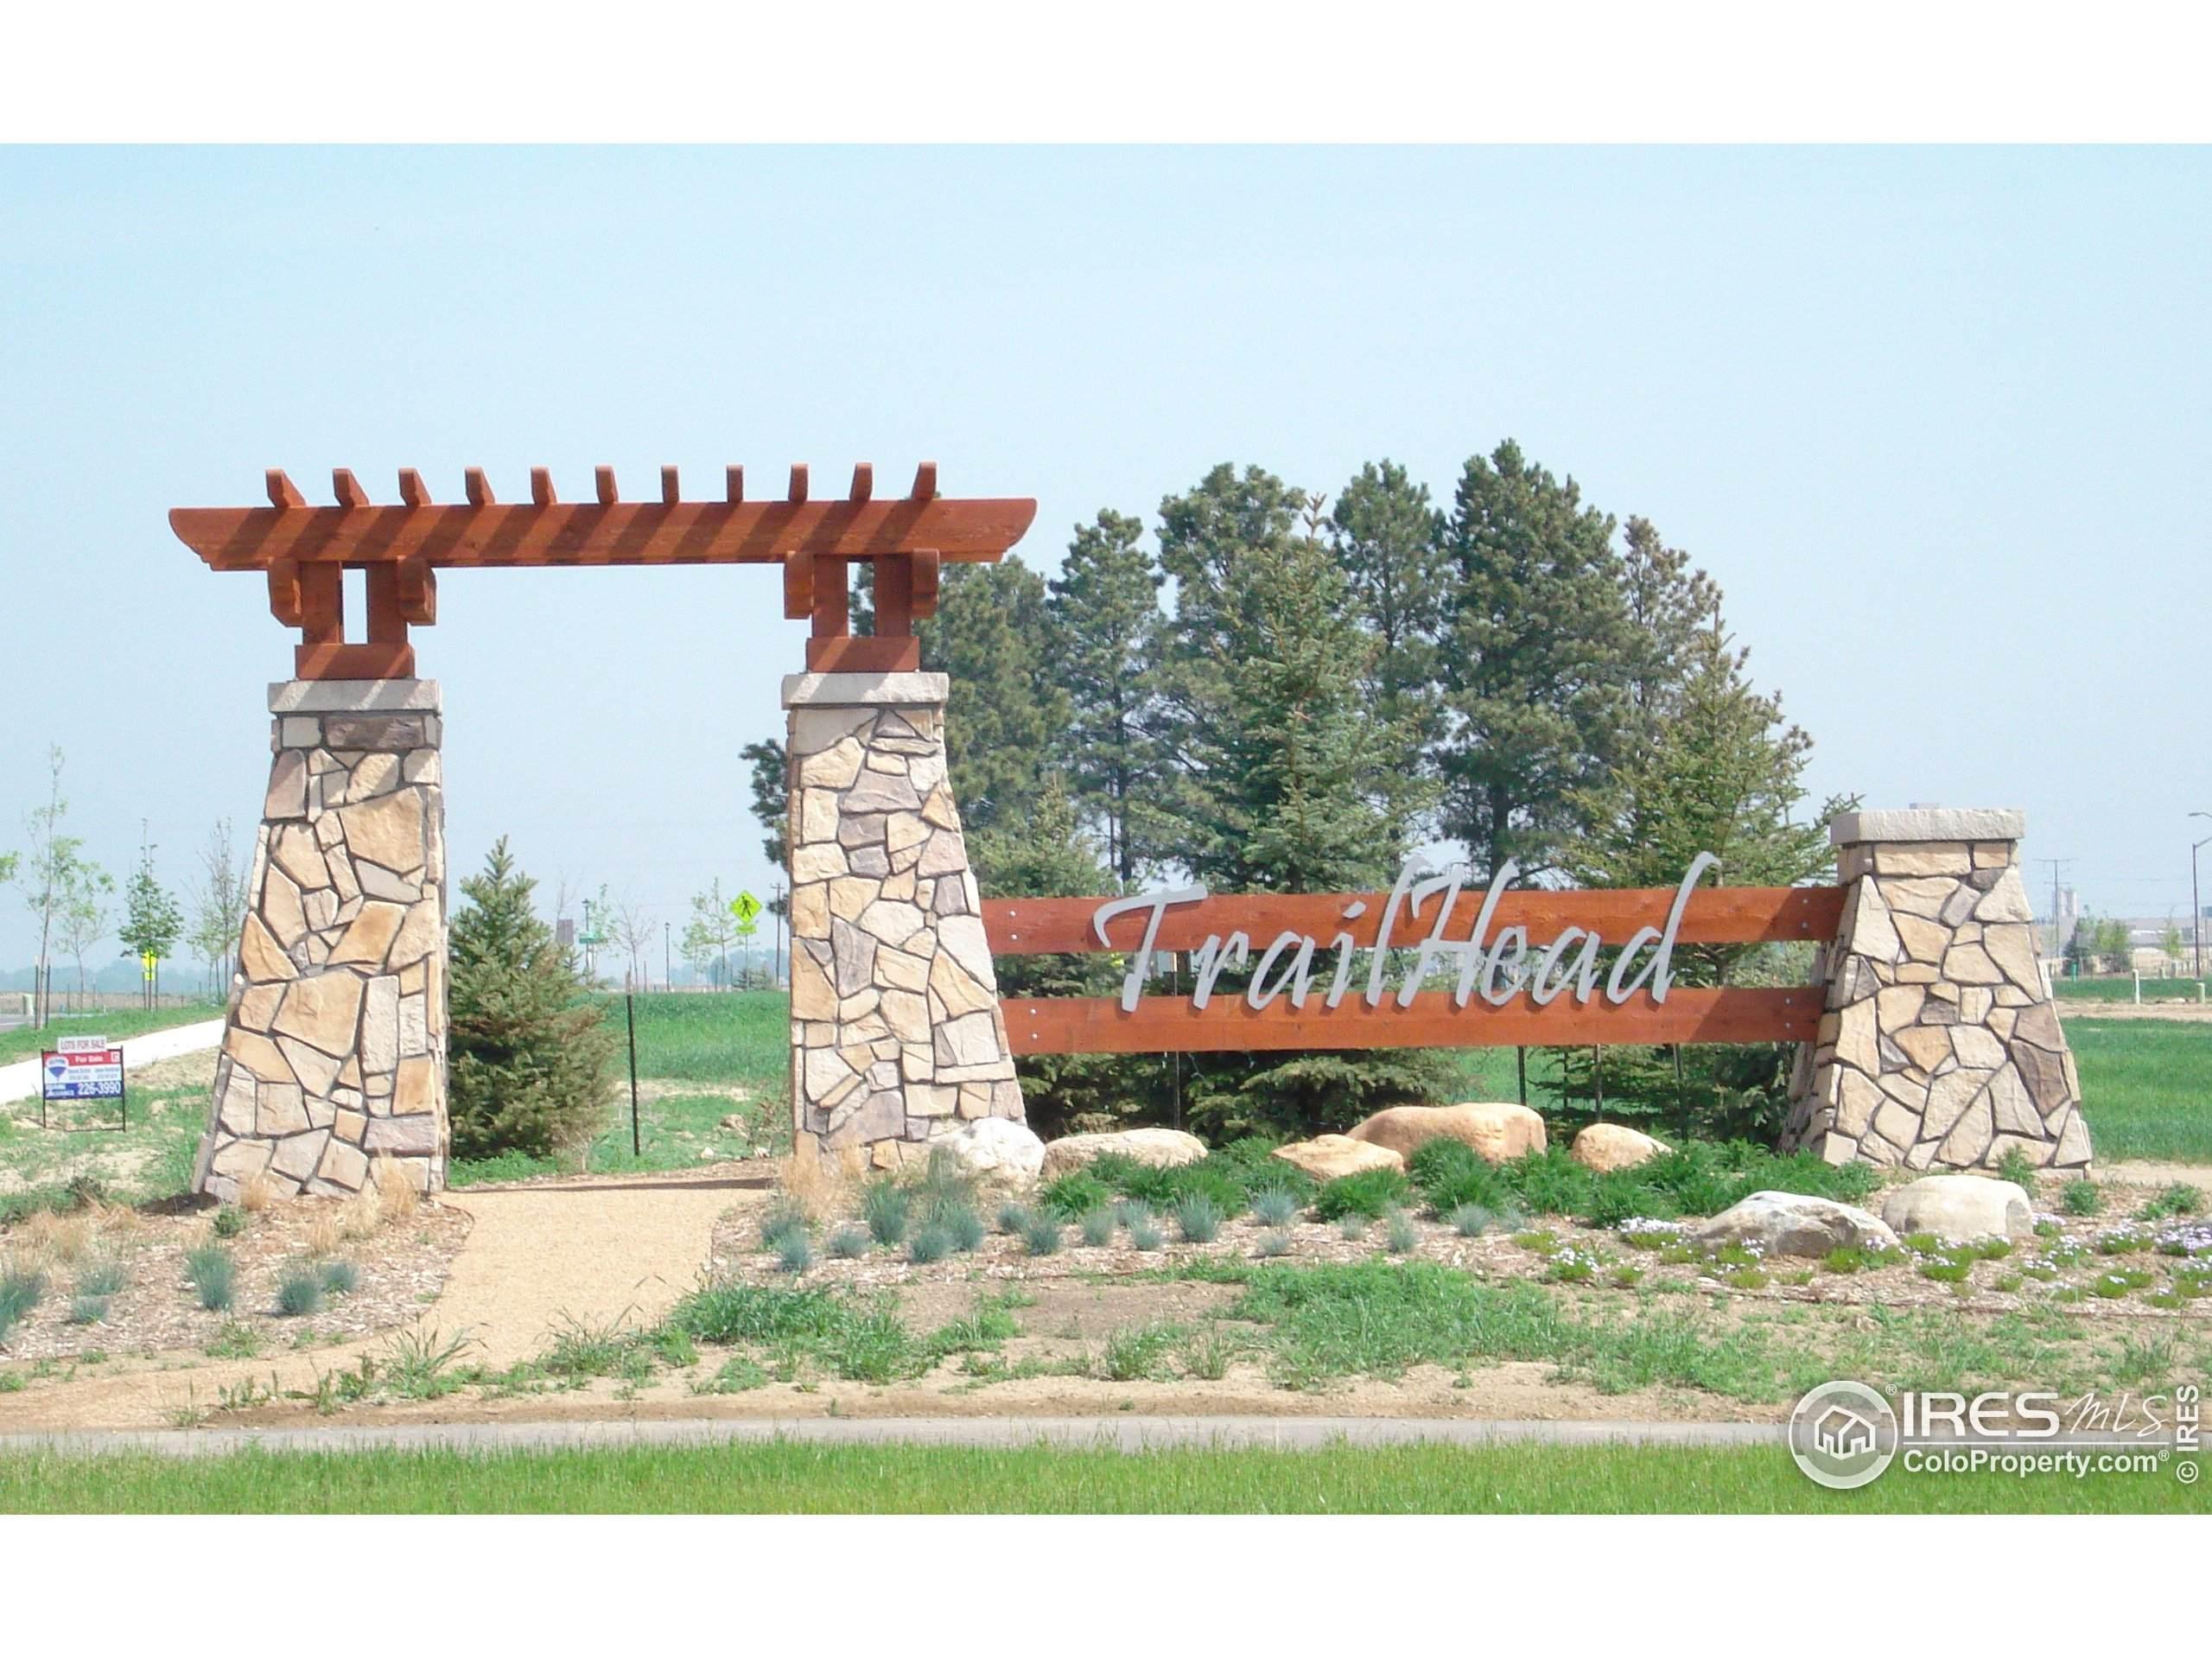 449 Whitney Hbr, Windsor, CO 80550 (MLS #920038) :: 8z Real Estate